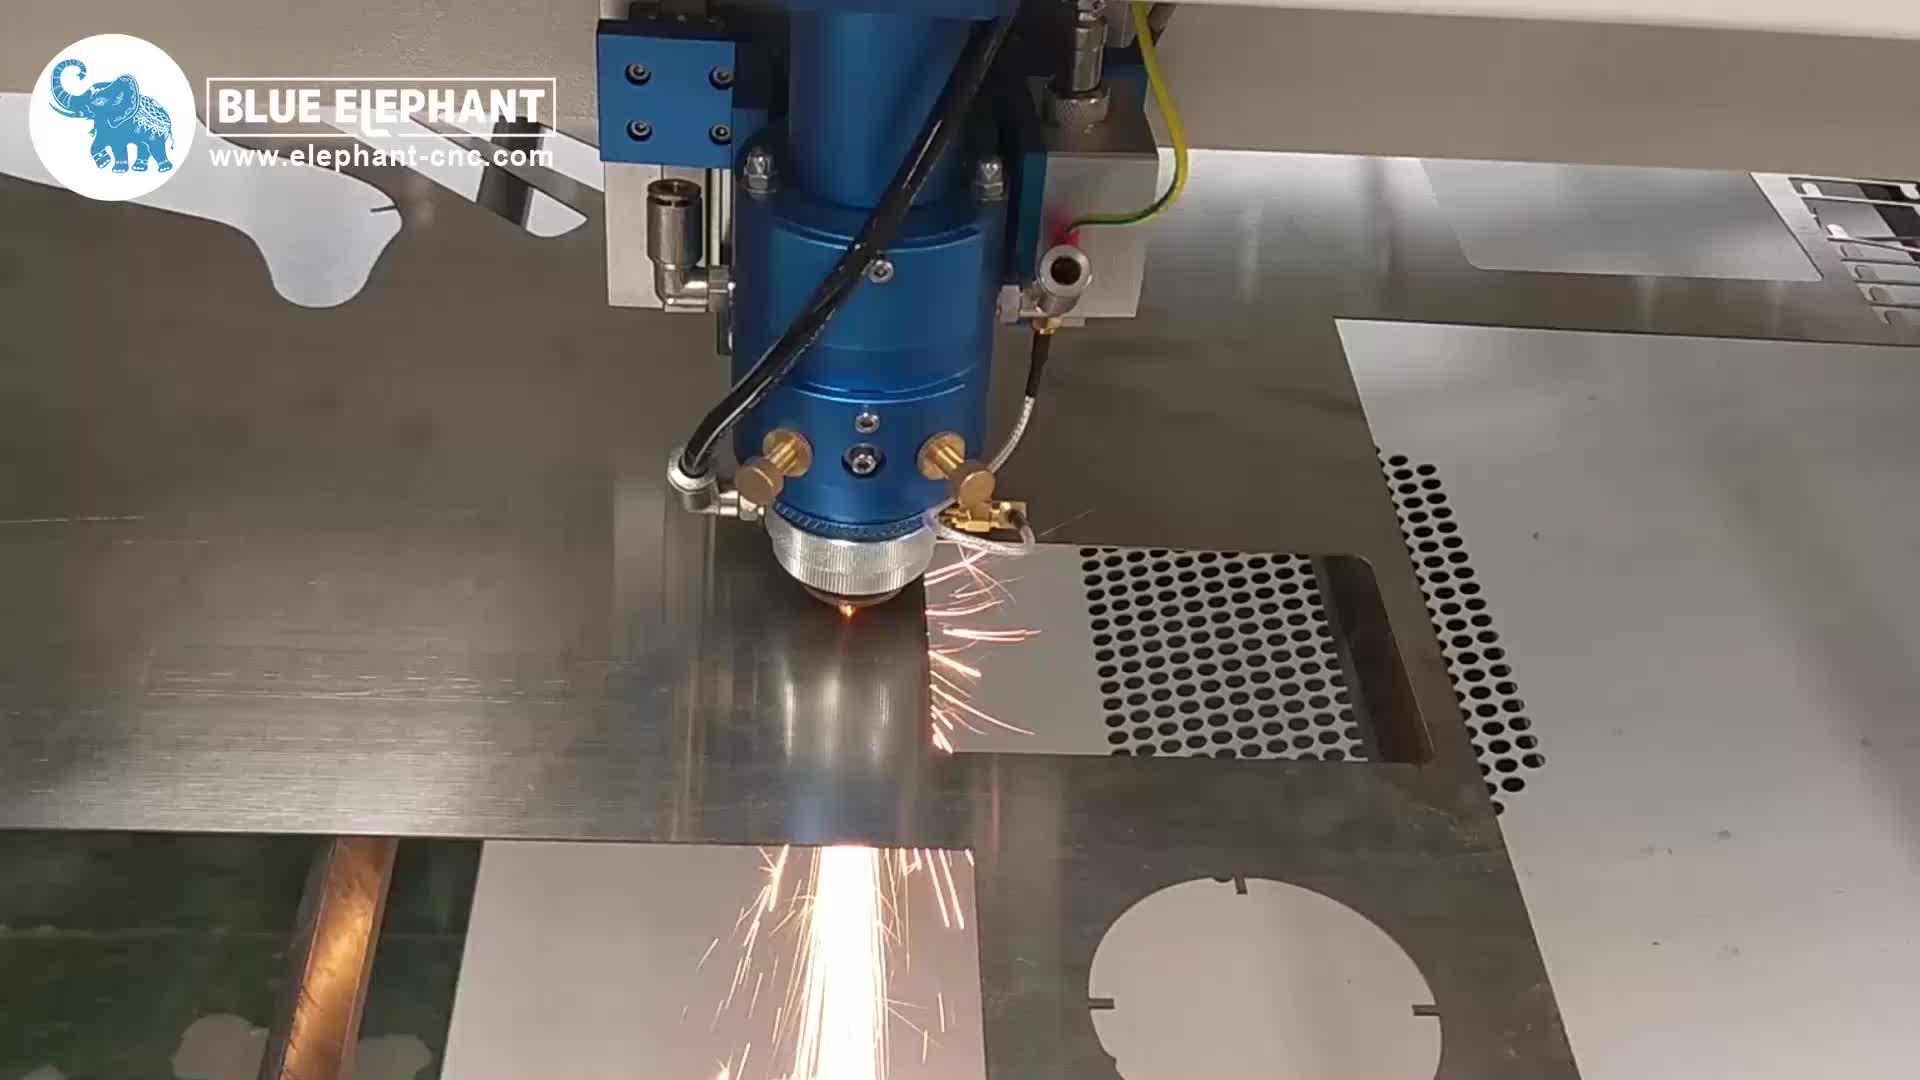 Fabrika fiyat cnc lazer makinesi/lazer kesme makinesi fiyat/lazer kesme makinesi satılık